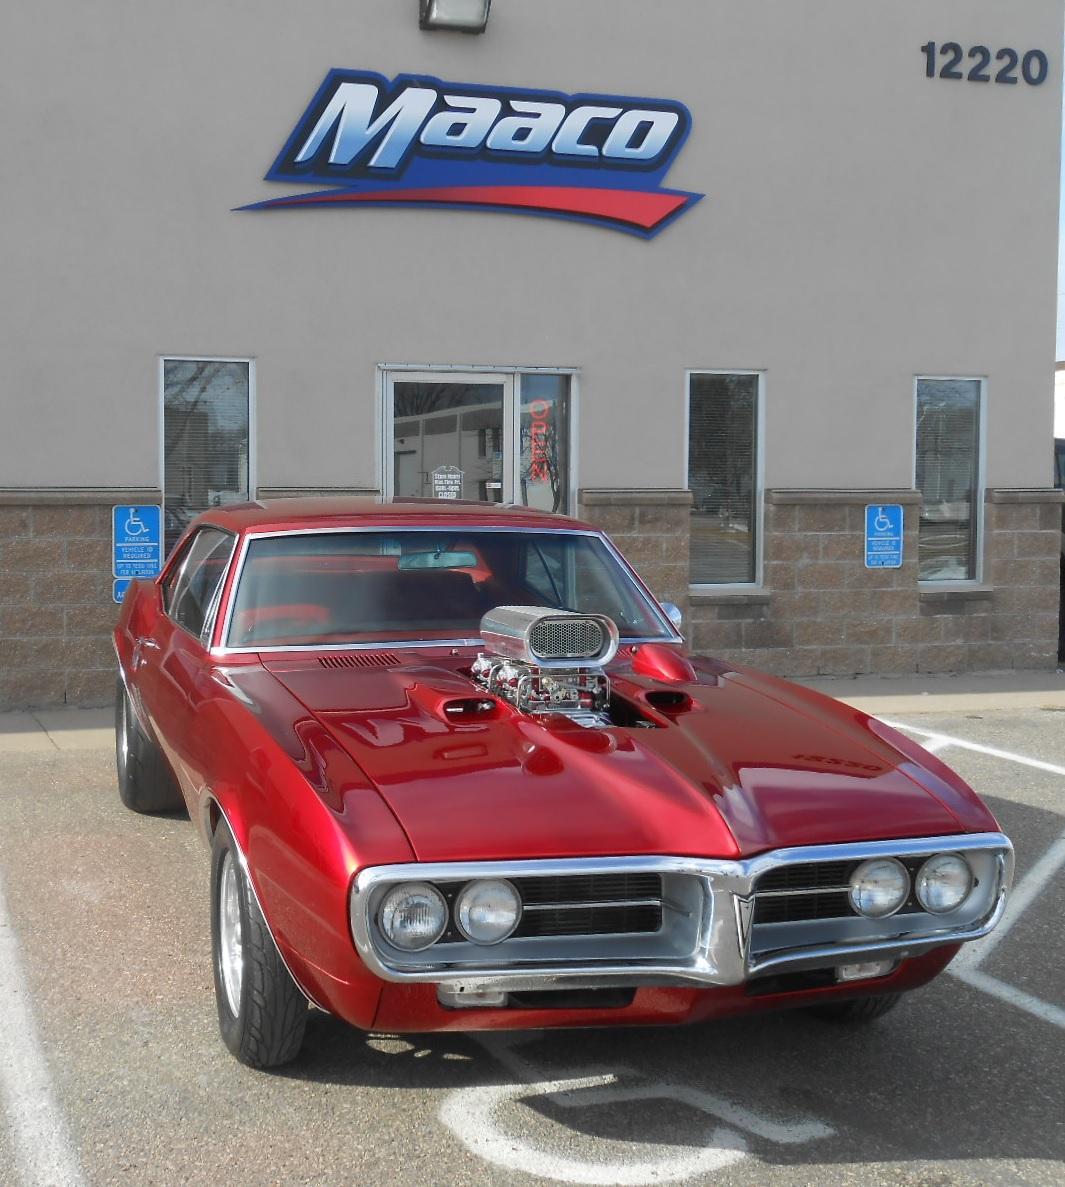 Maaco Collision Repair & Auto Painting image 14